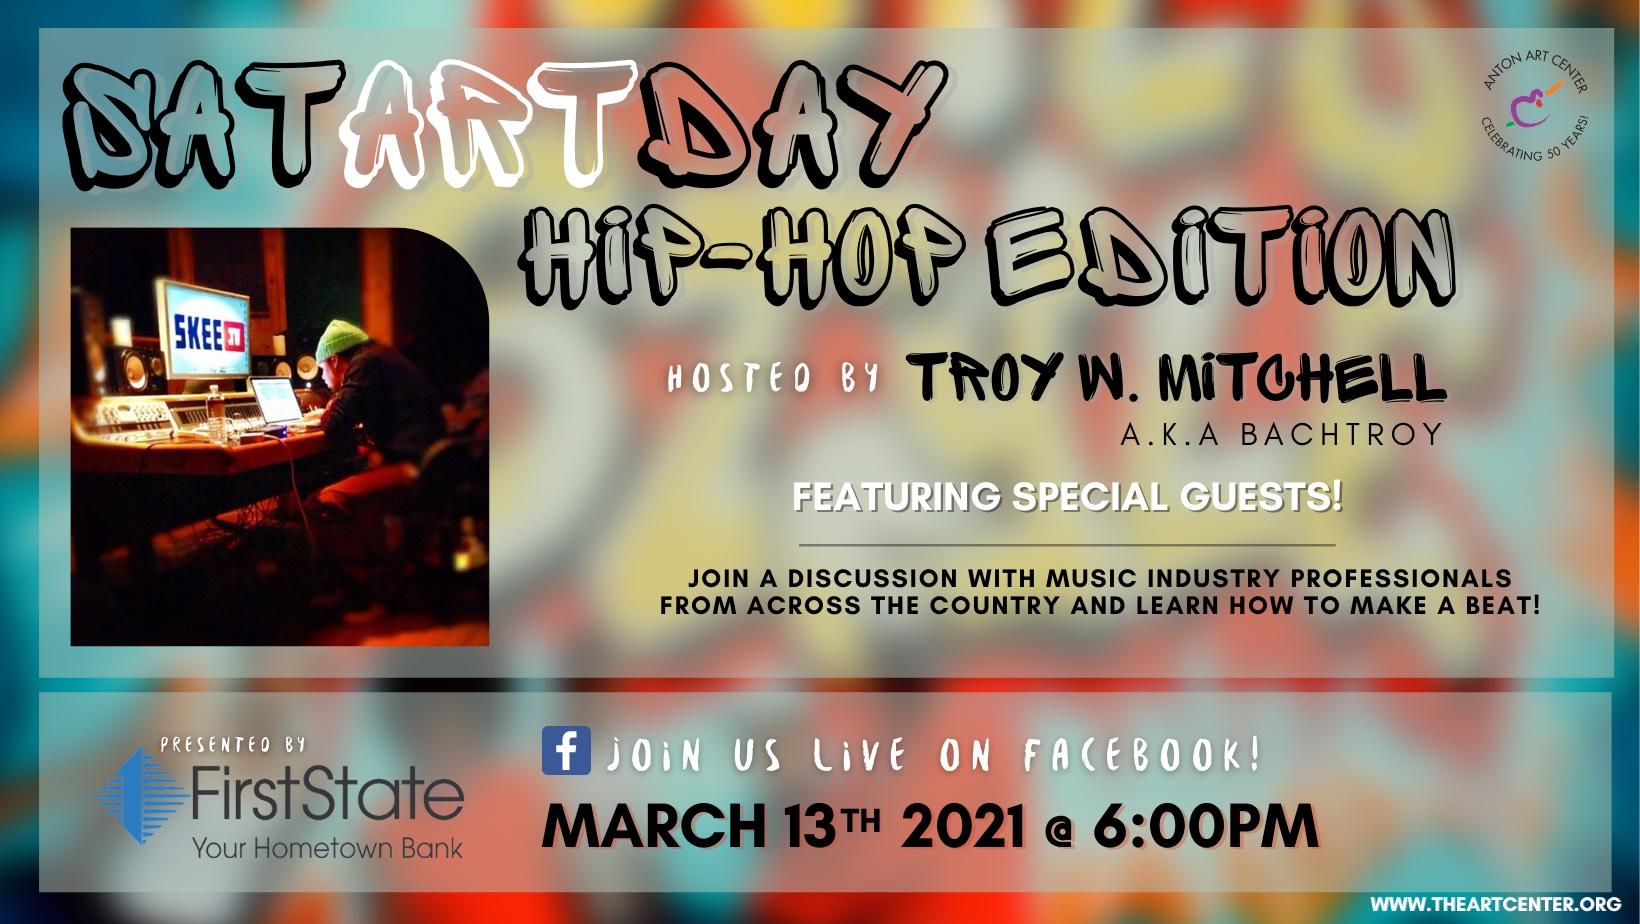 SatARTday hip-hop 2